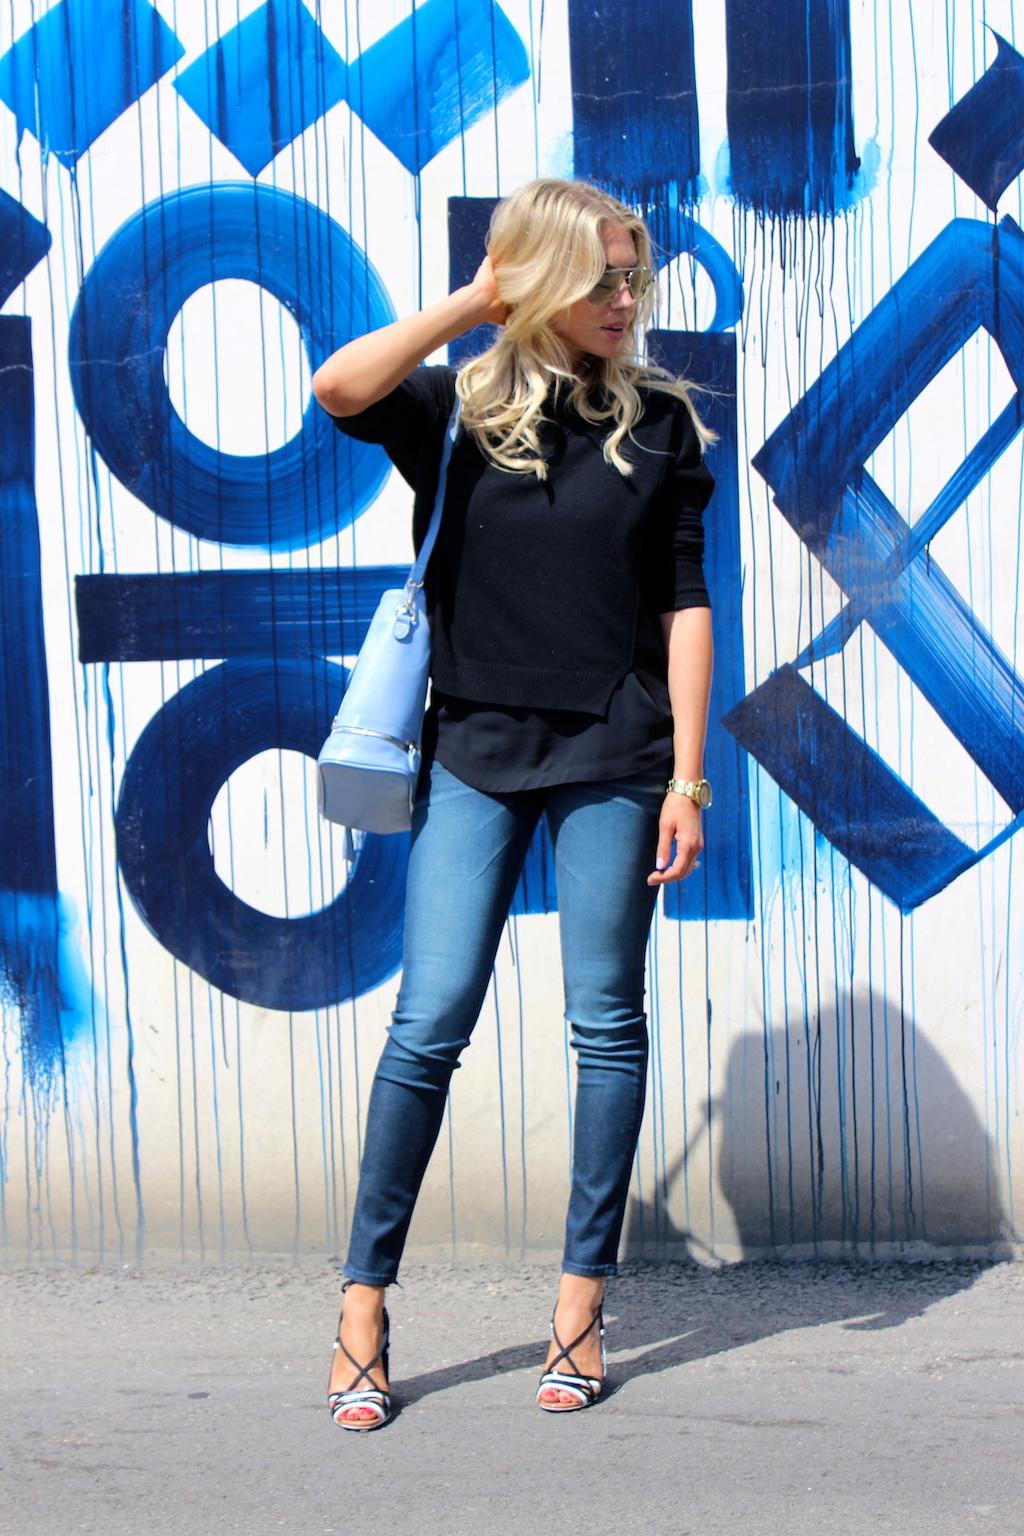 skinny jeans - denim - stassi schroeder - just stassi